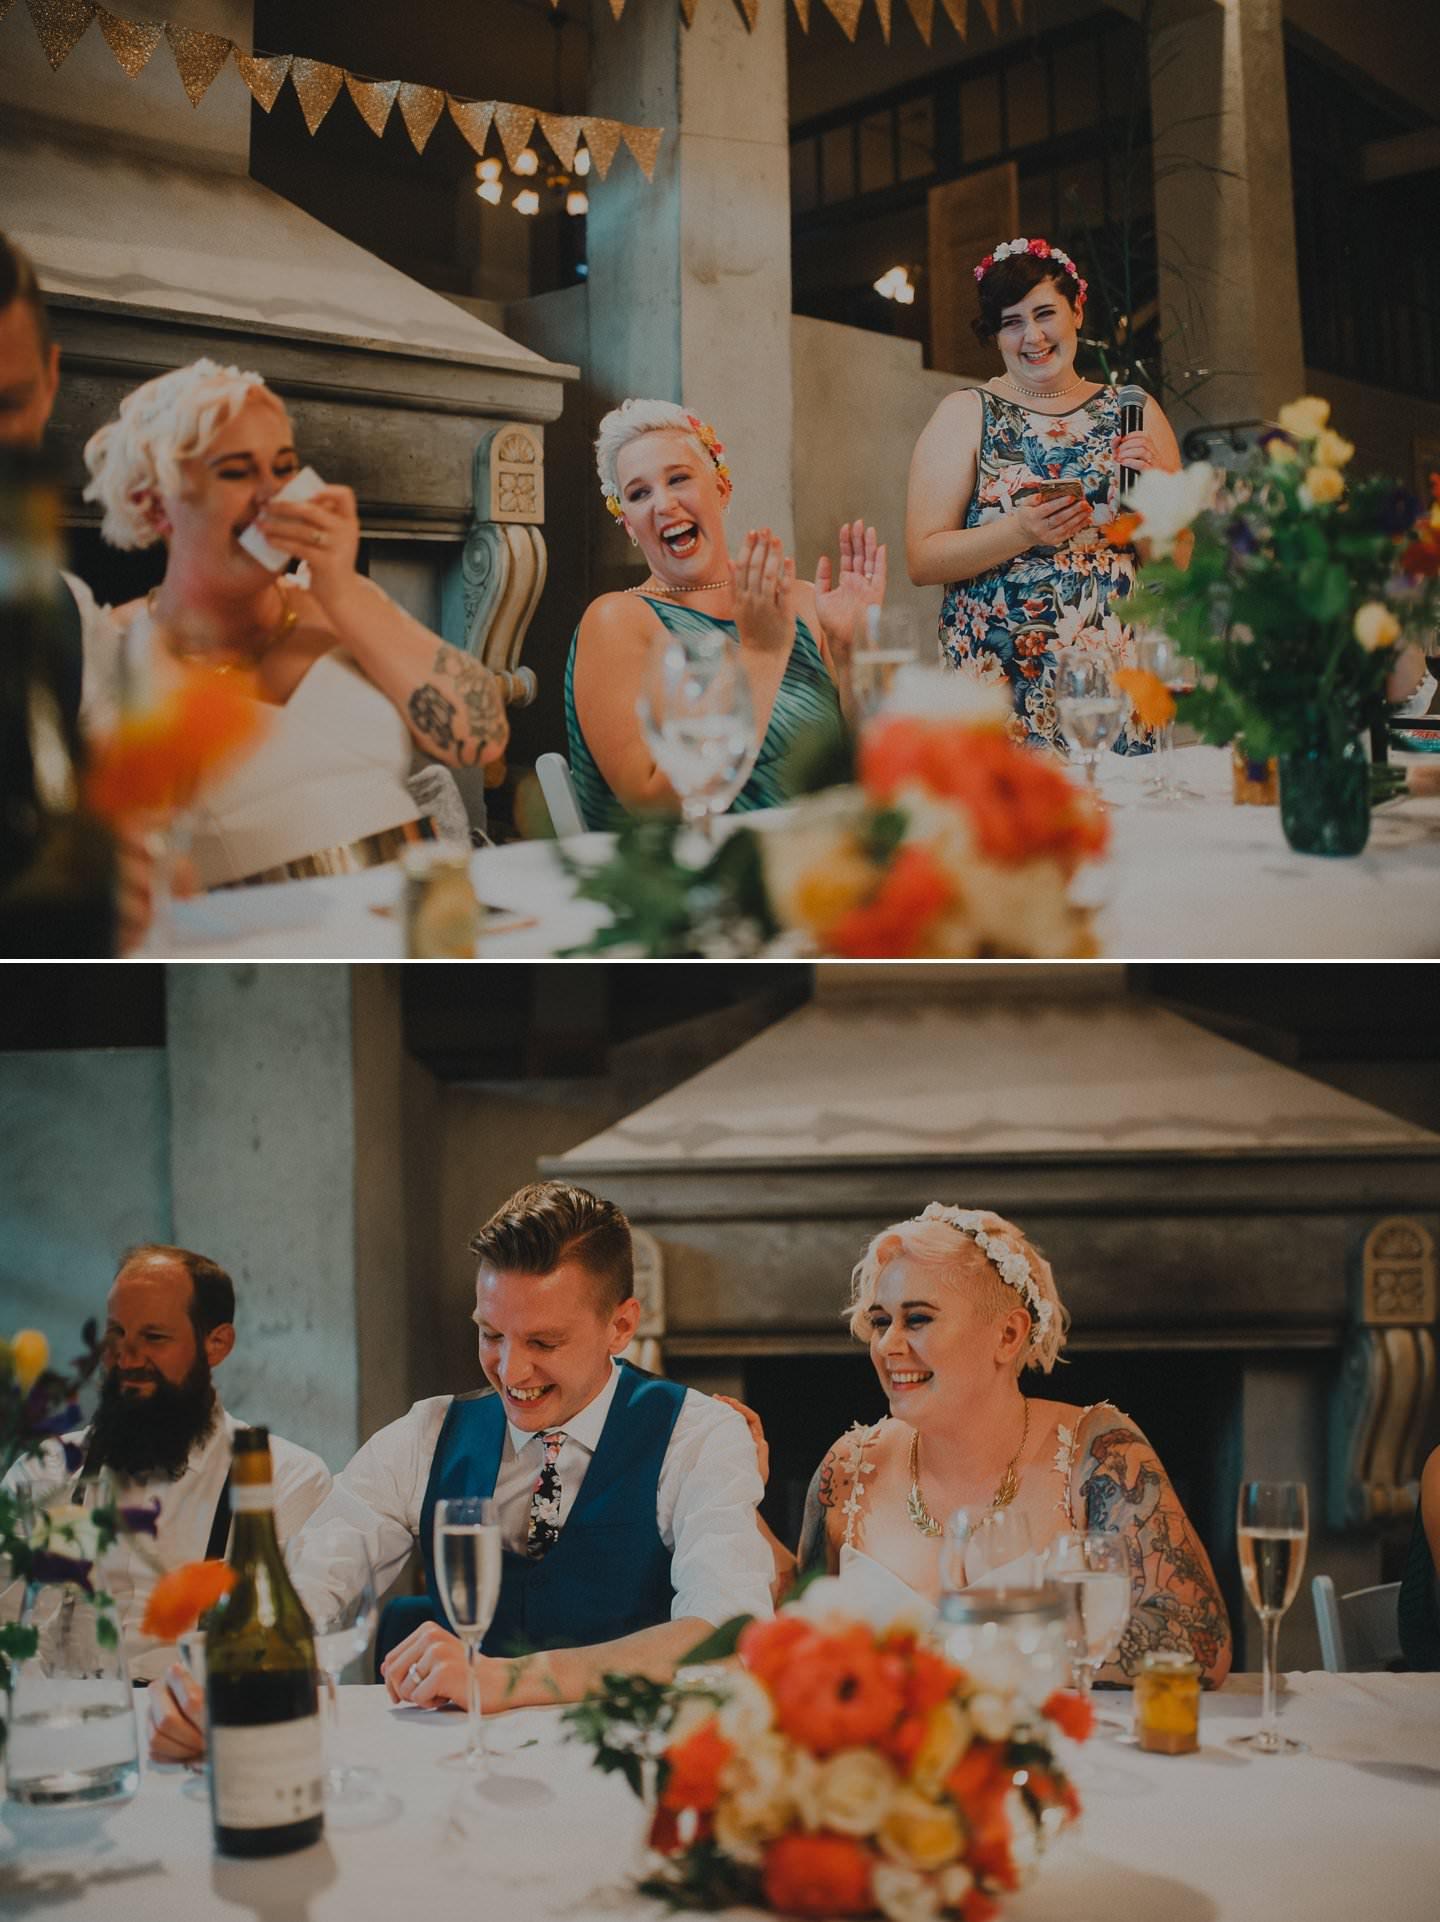 Speeches at wedding reception